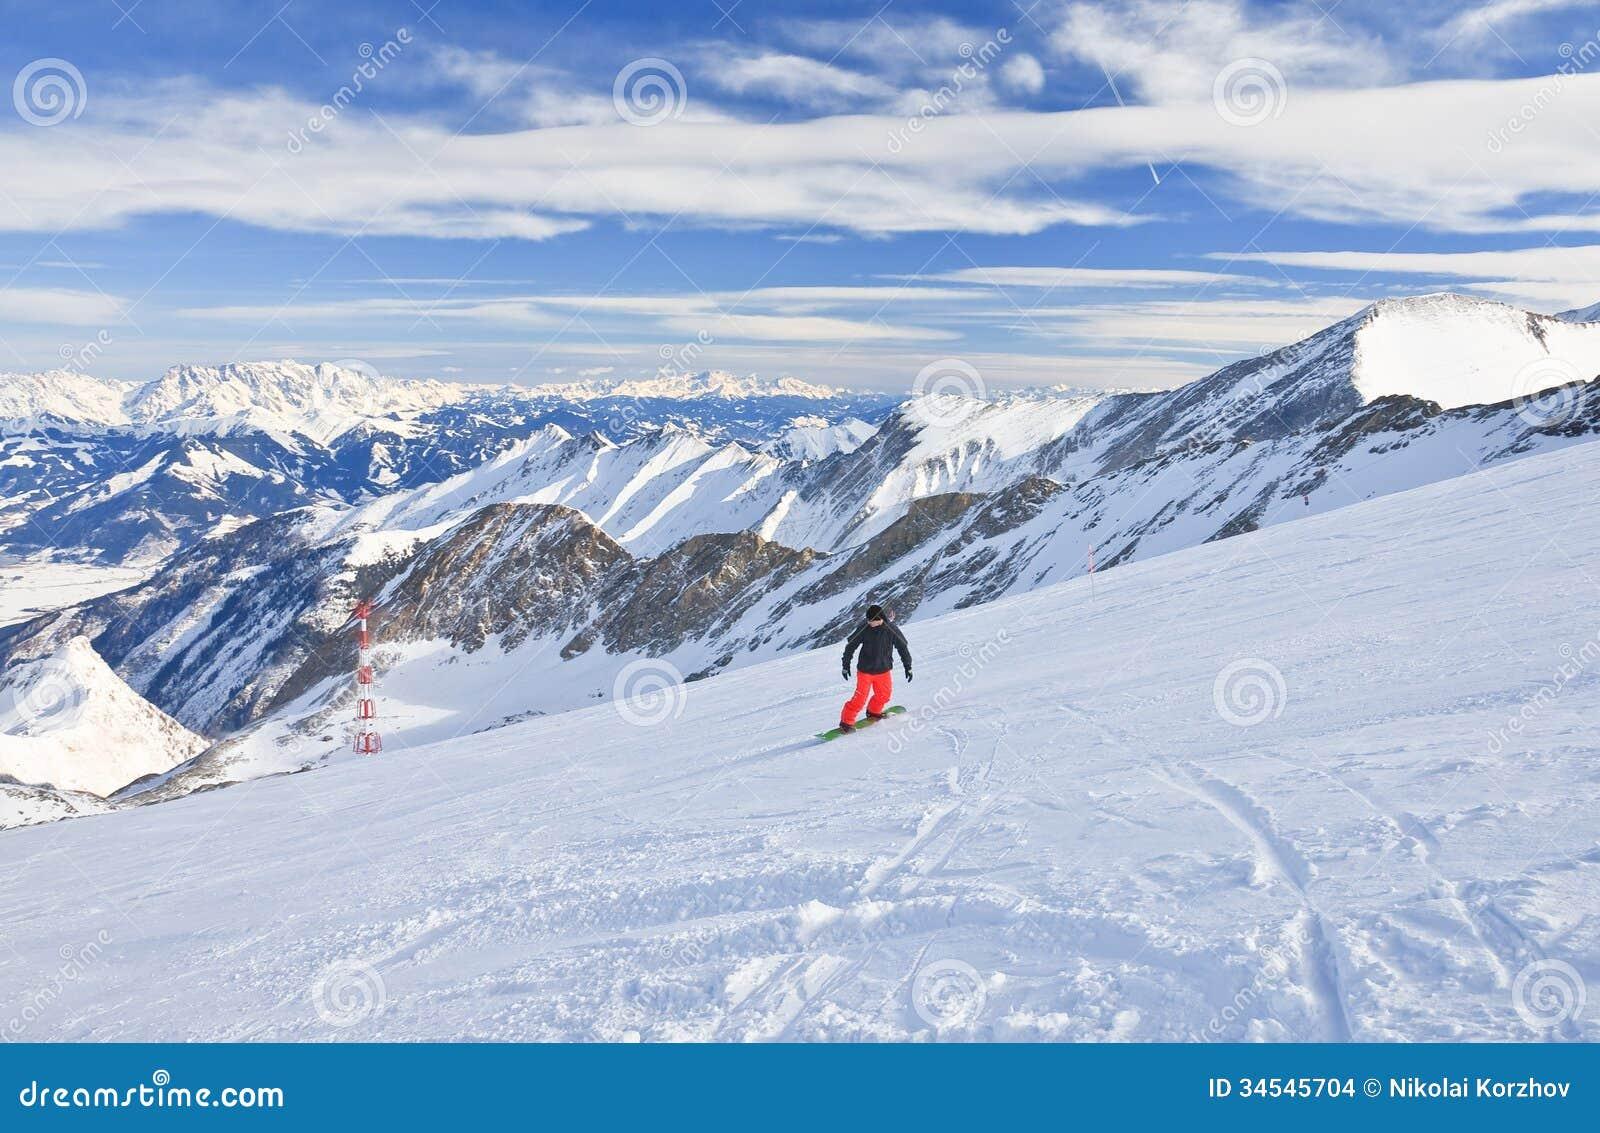 snowboarder. ski resort of kaprun, austria editorial stock image